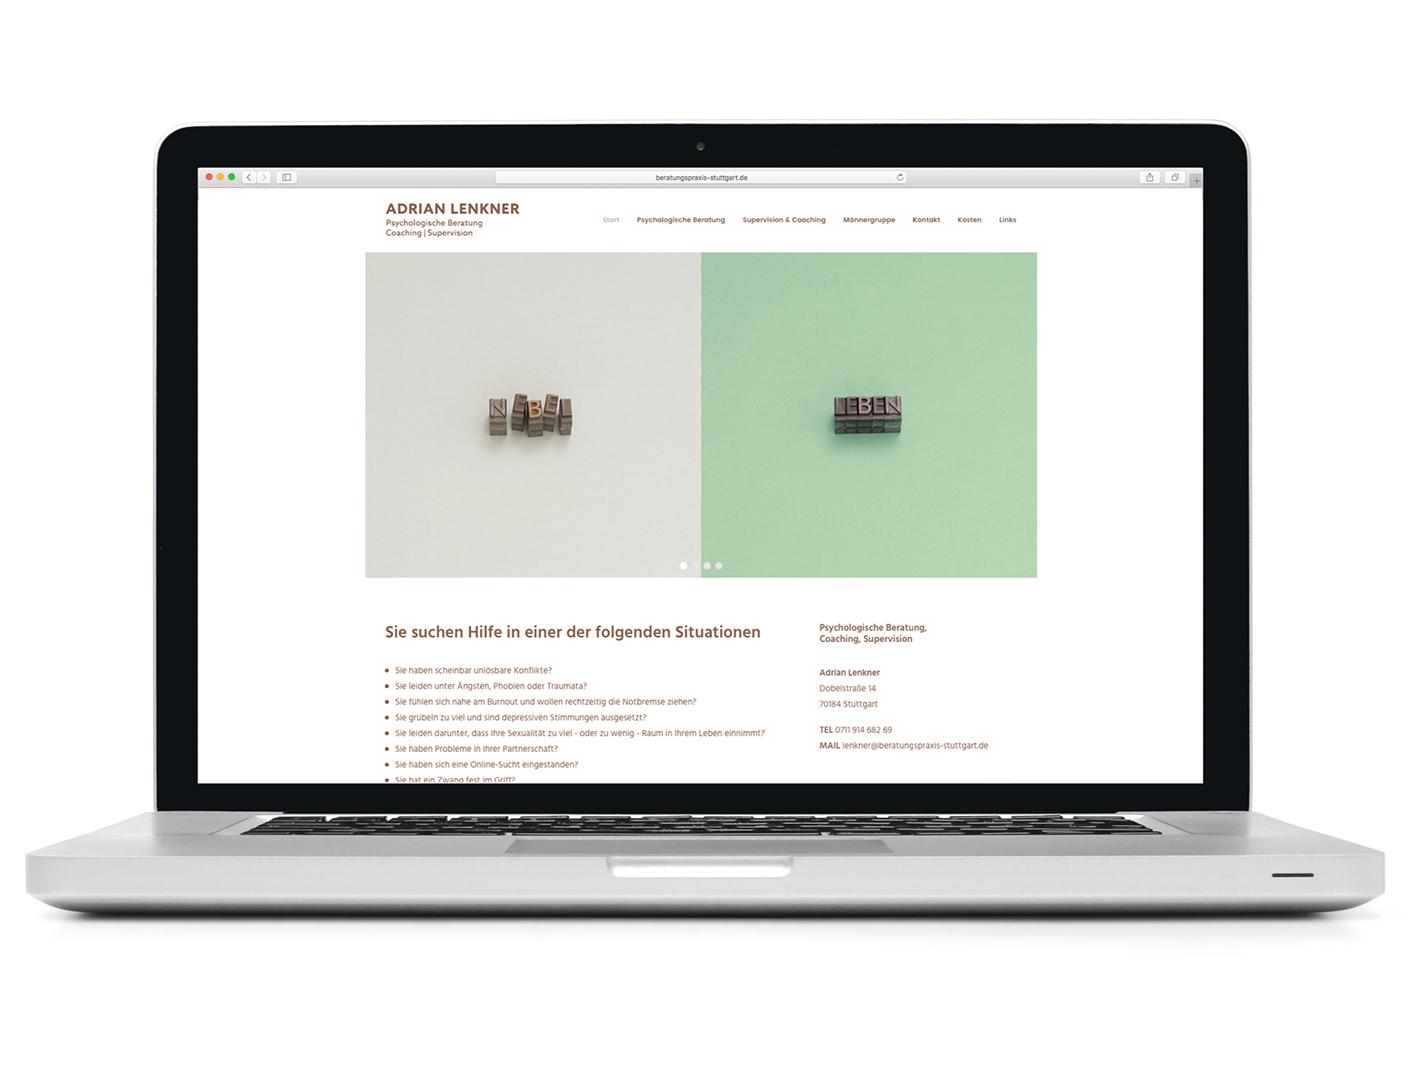 ATK-LENKNER-coaching-beratung-Corporate-Design-108.jpg